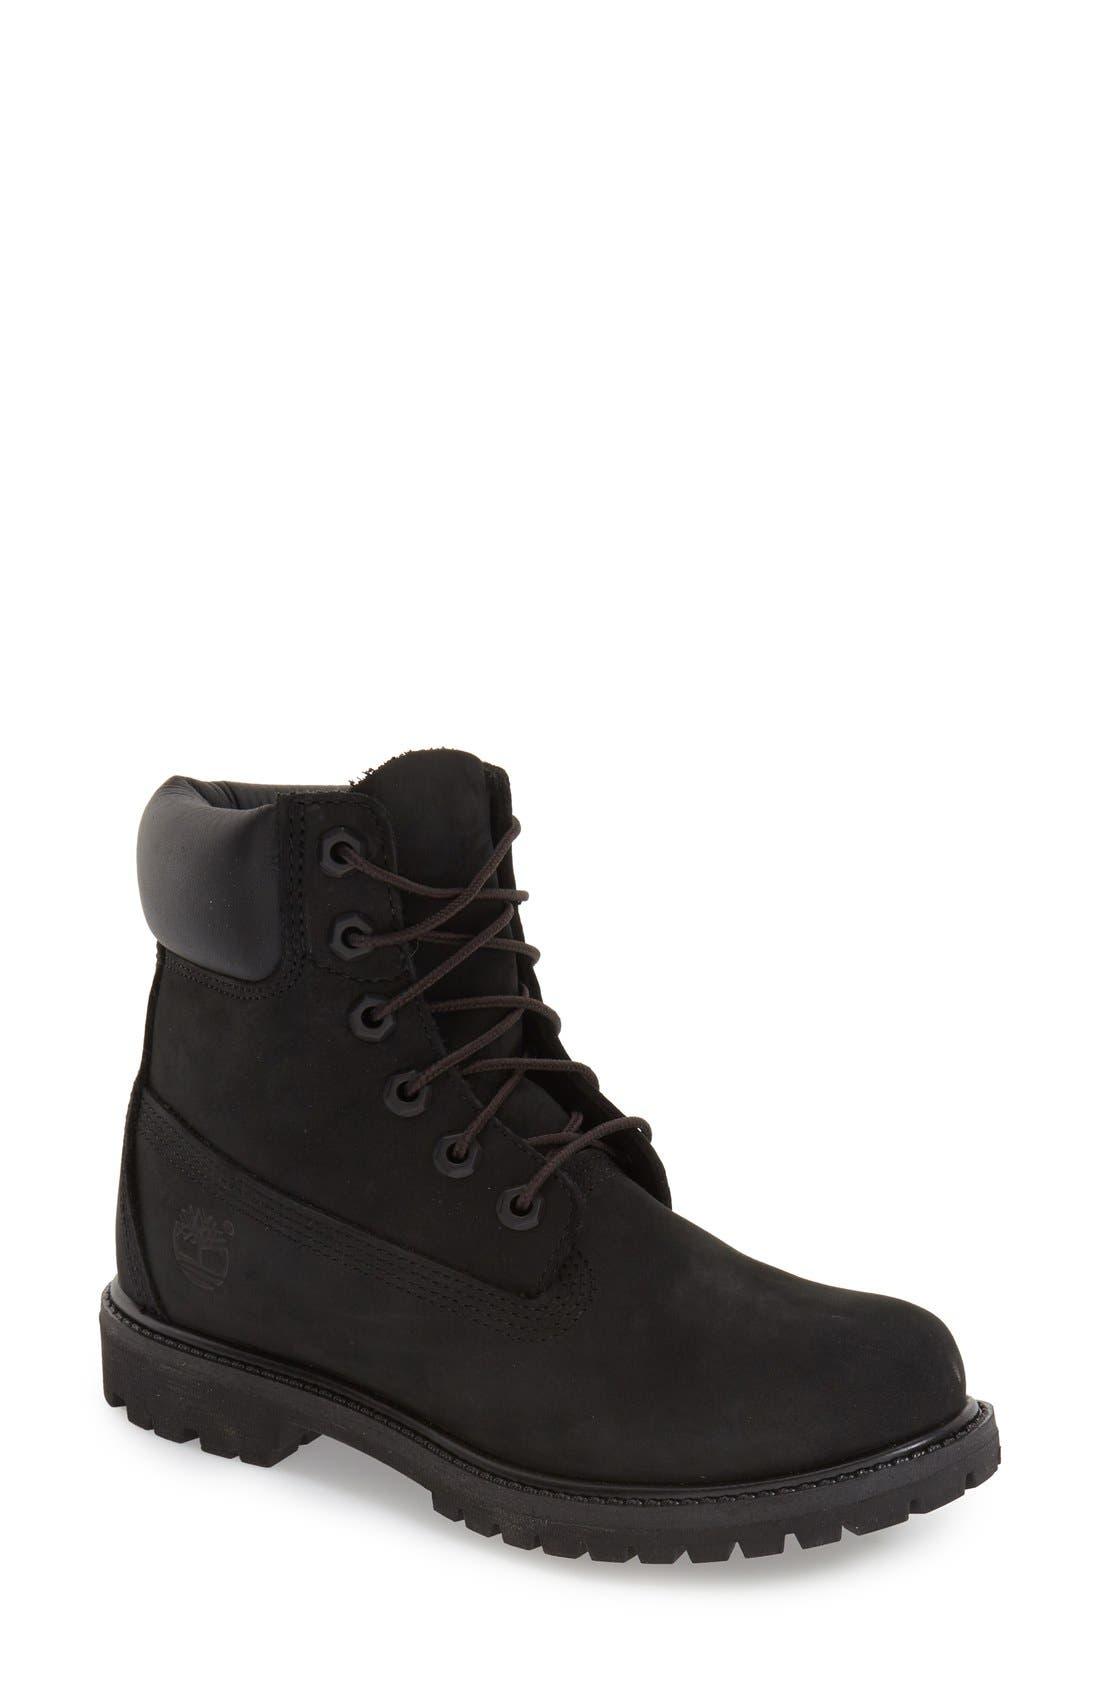 '6 Inch Premium' Waterproof Boot,                             Main thumbnail 1, color,                             Black Nubuck Leather